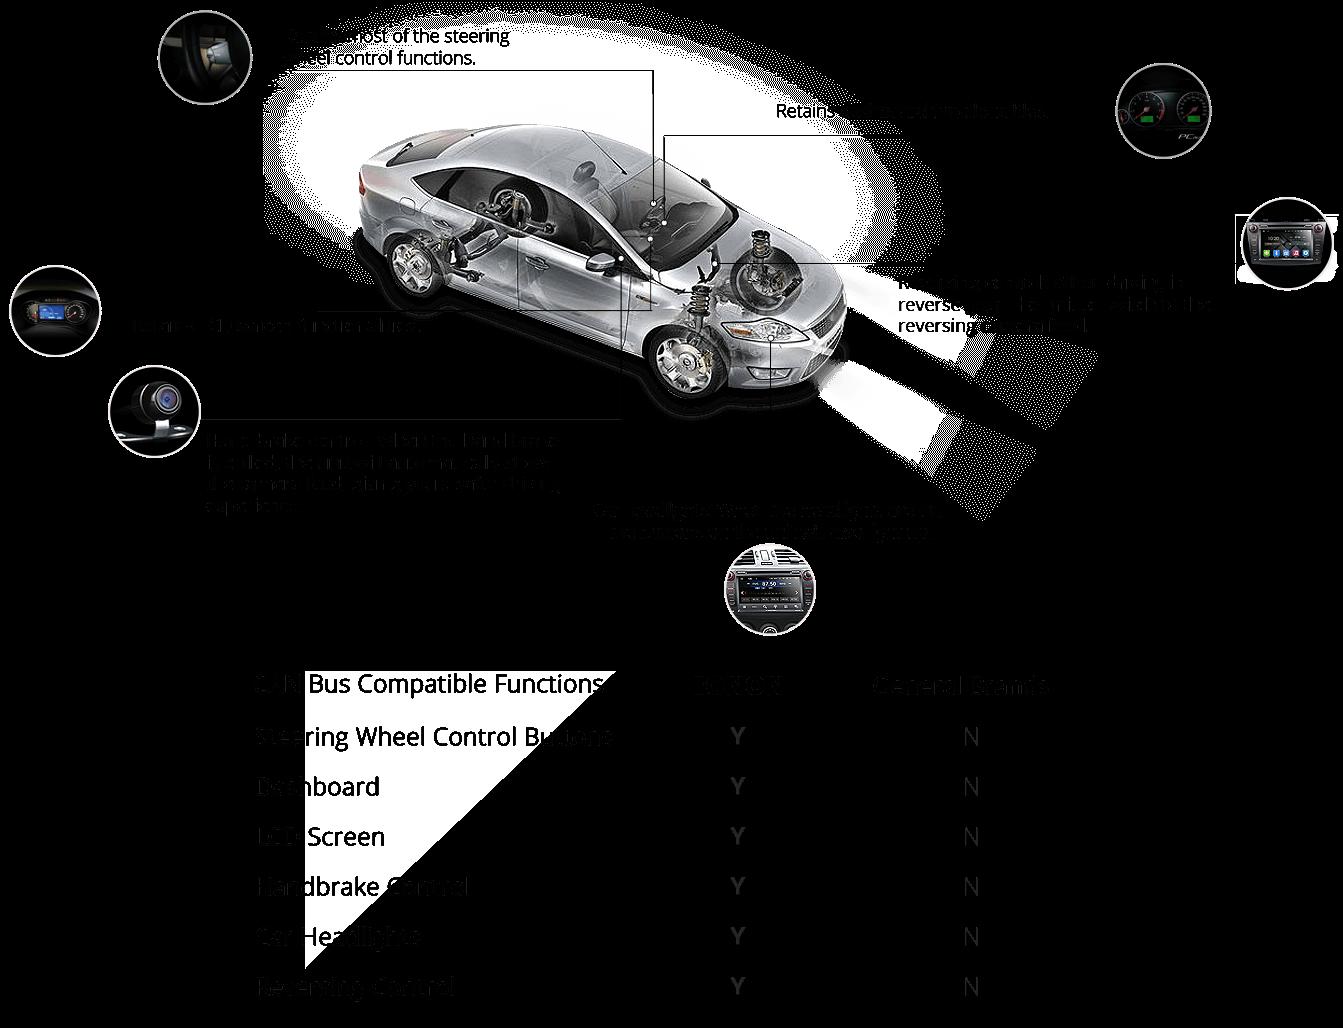 Eonon GA6163F | Mazda 3 2010-2013 Android 5.1 Lollipop Car GPS ...